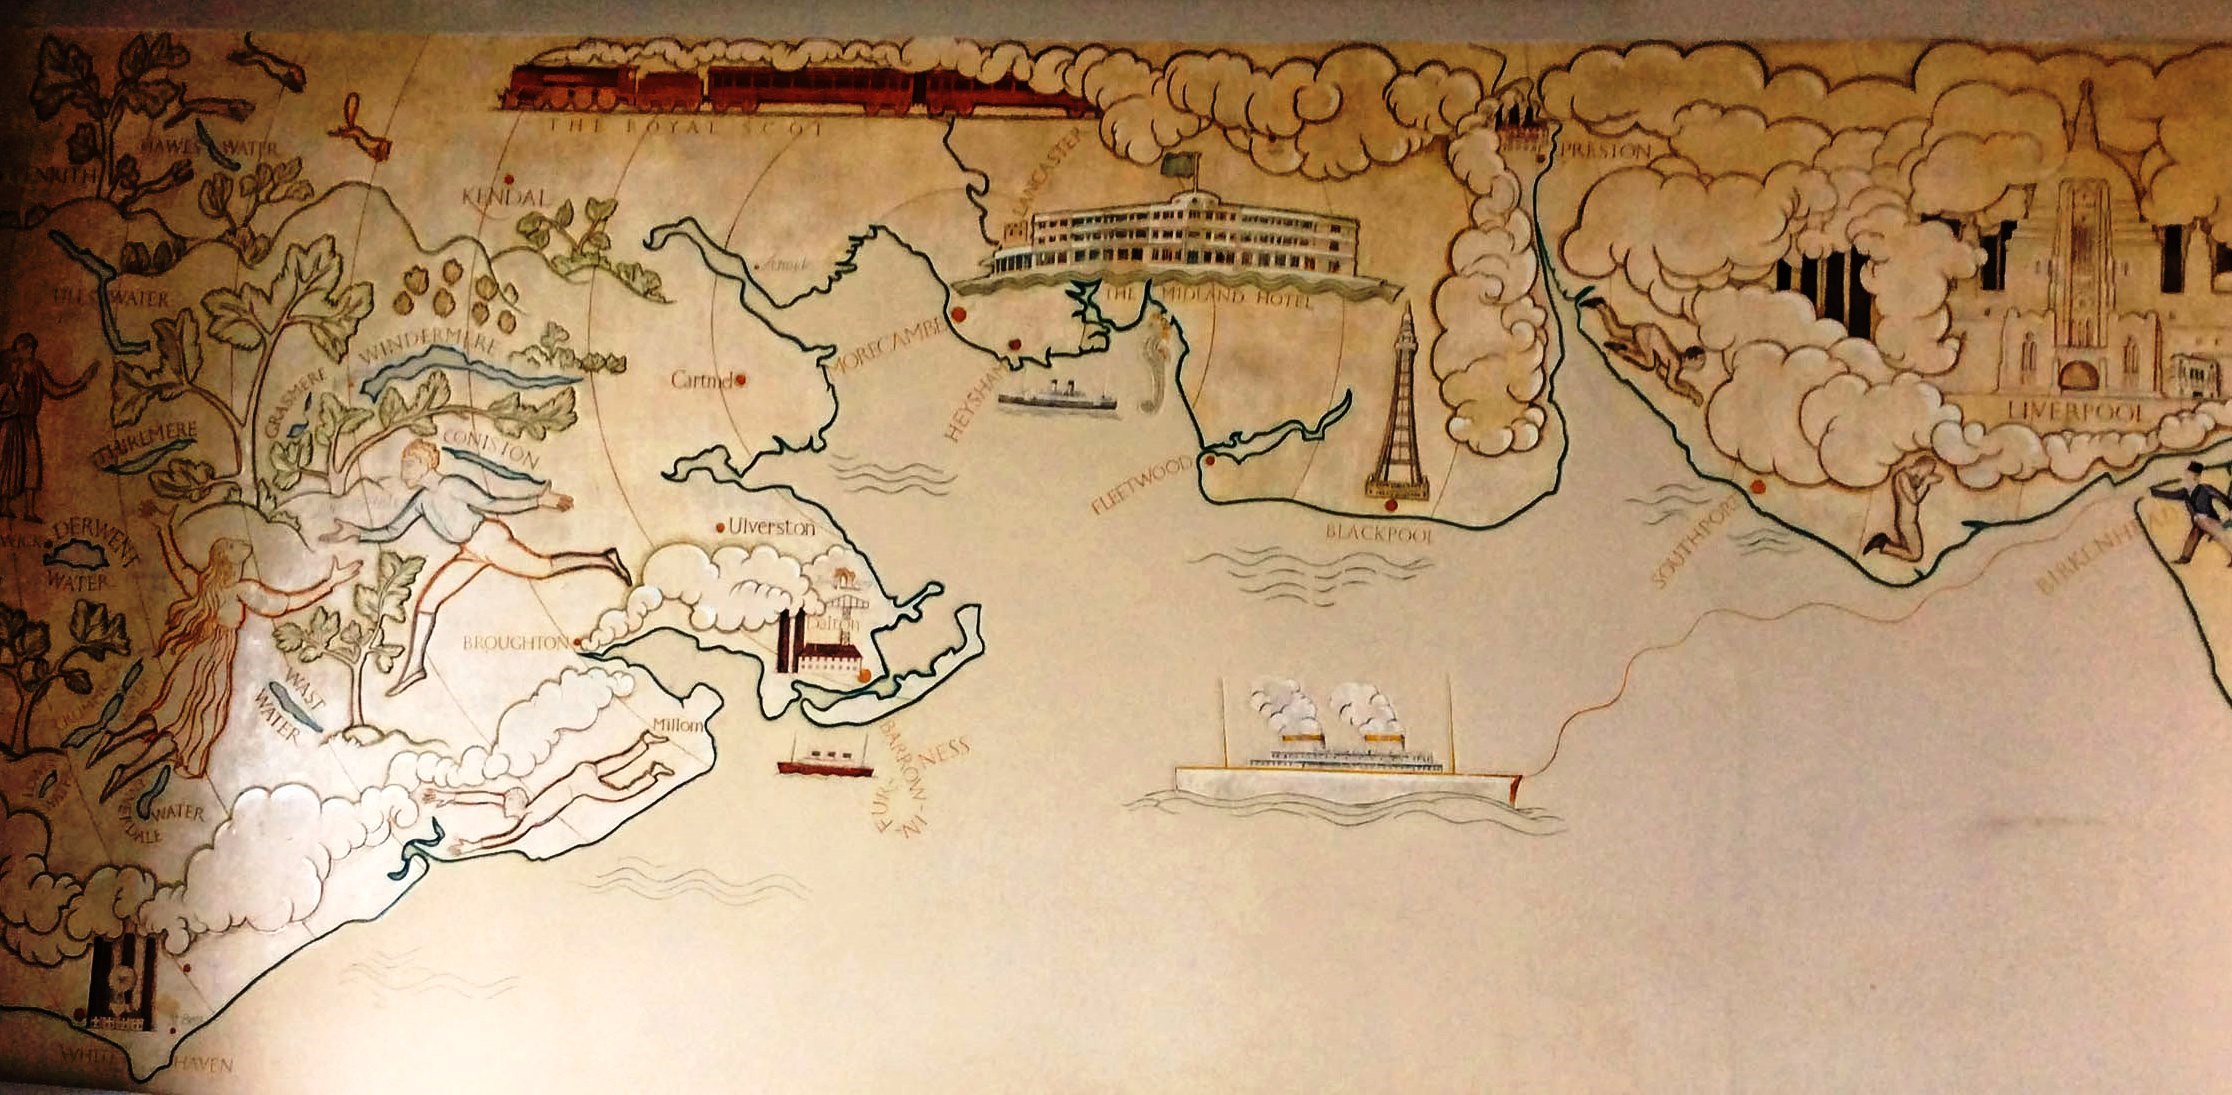 Eric Gill Morecambe Bay Mural - Midland Hotel